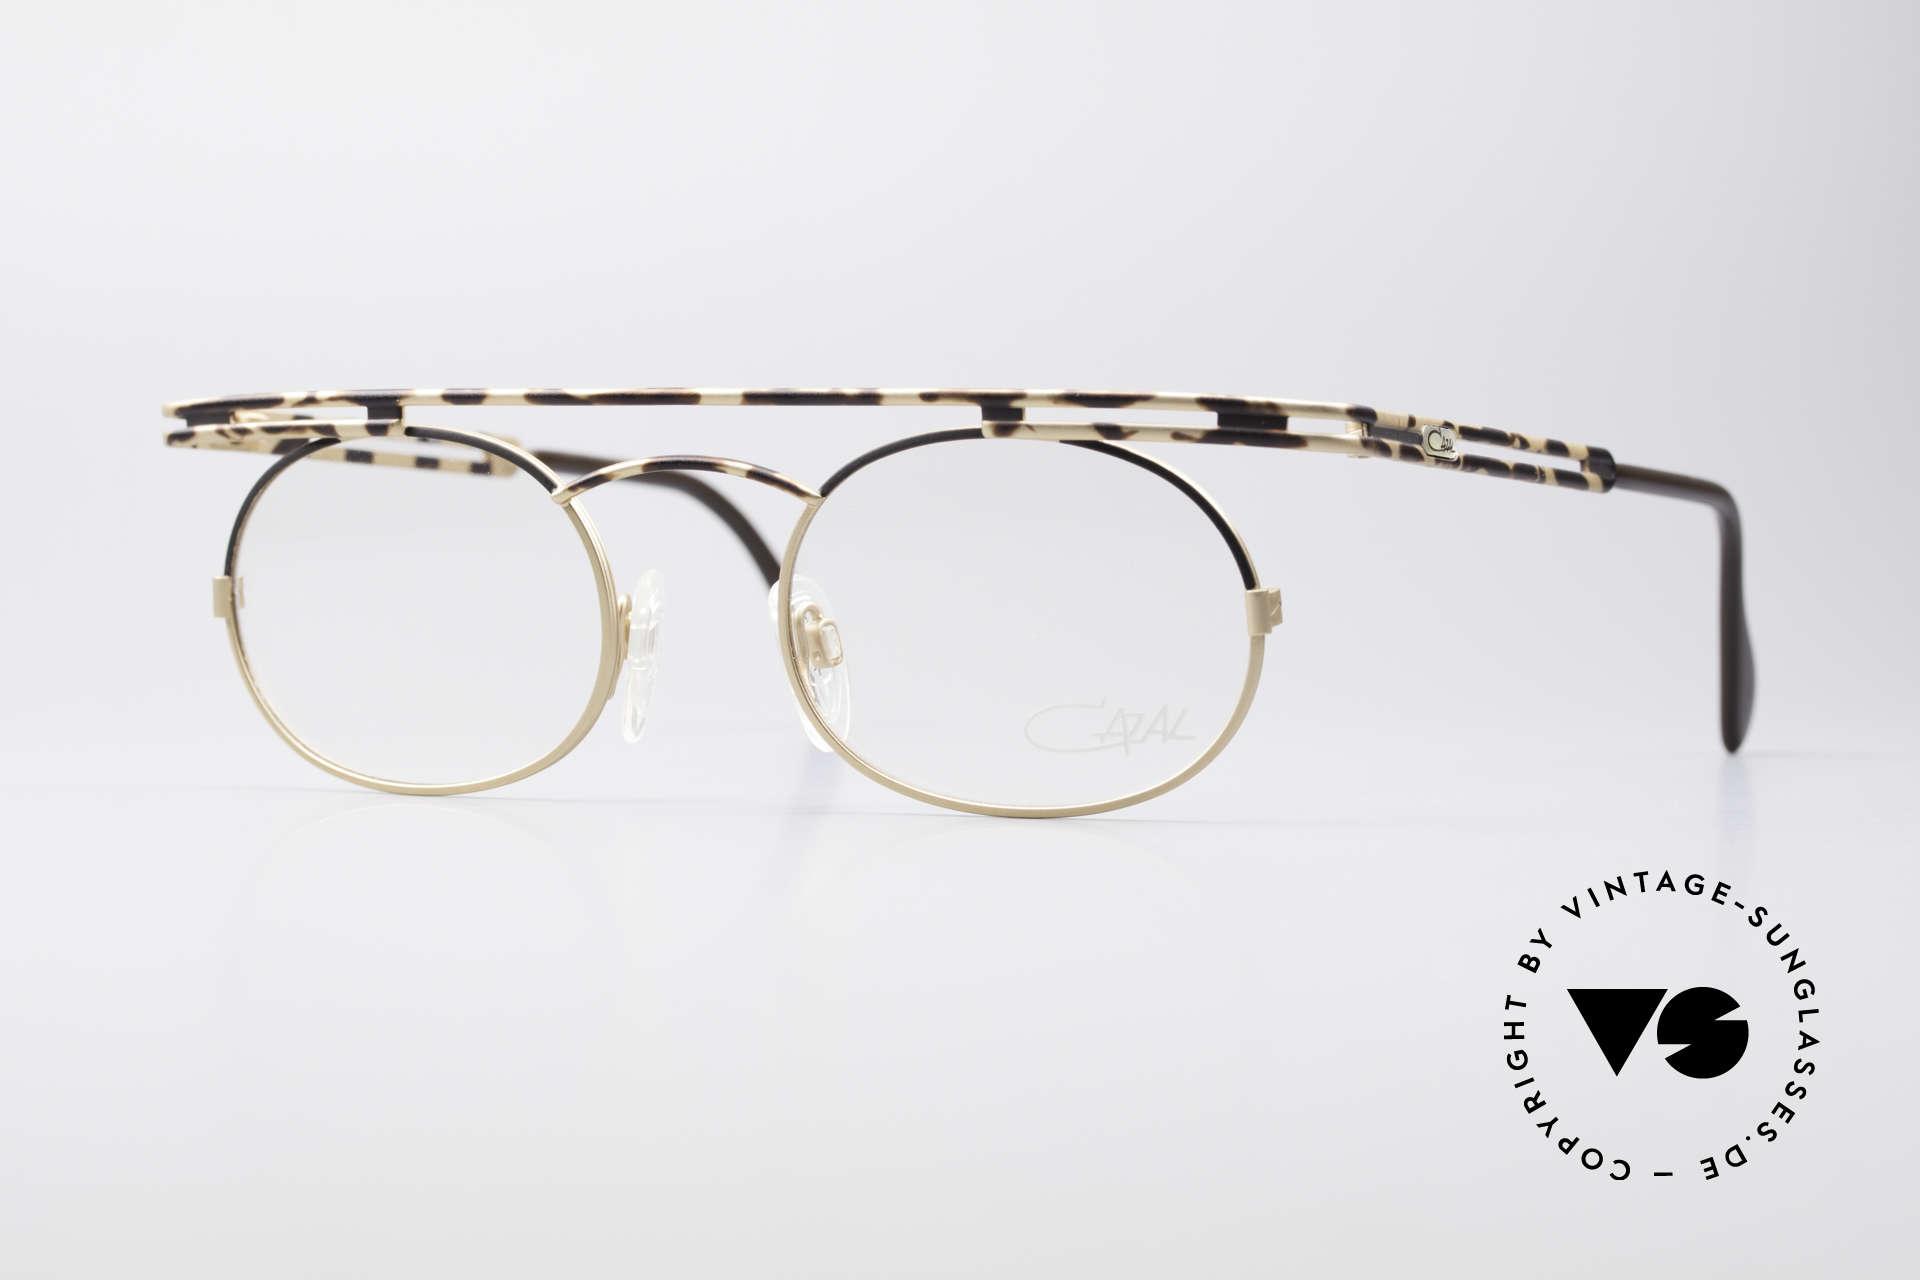 Cazal 761 NO Retro Glasses Vintage Frame, expressive CAZAL vintage eyeglasses from app. 1997, Made for Men and Women